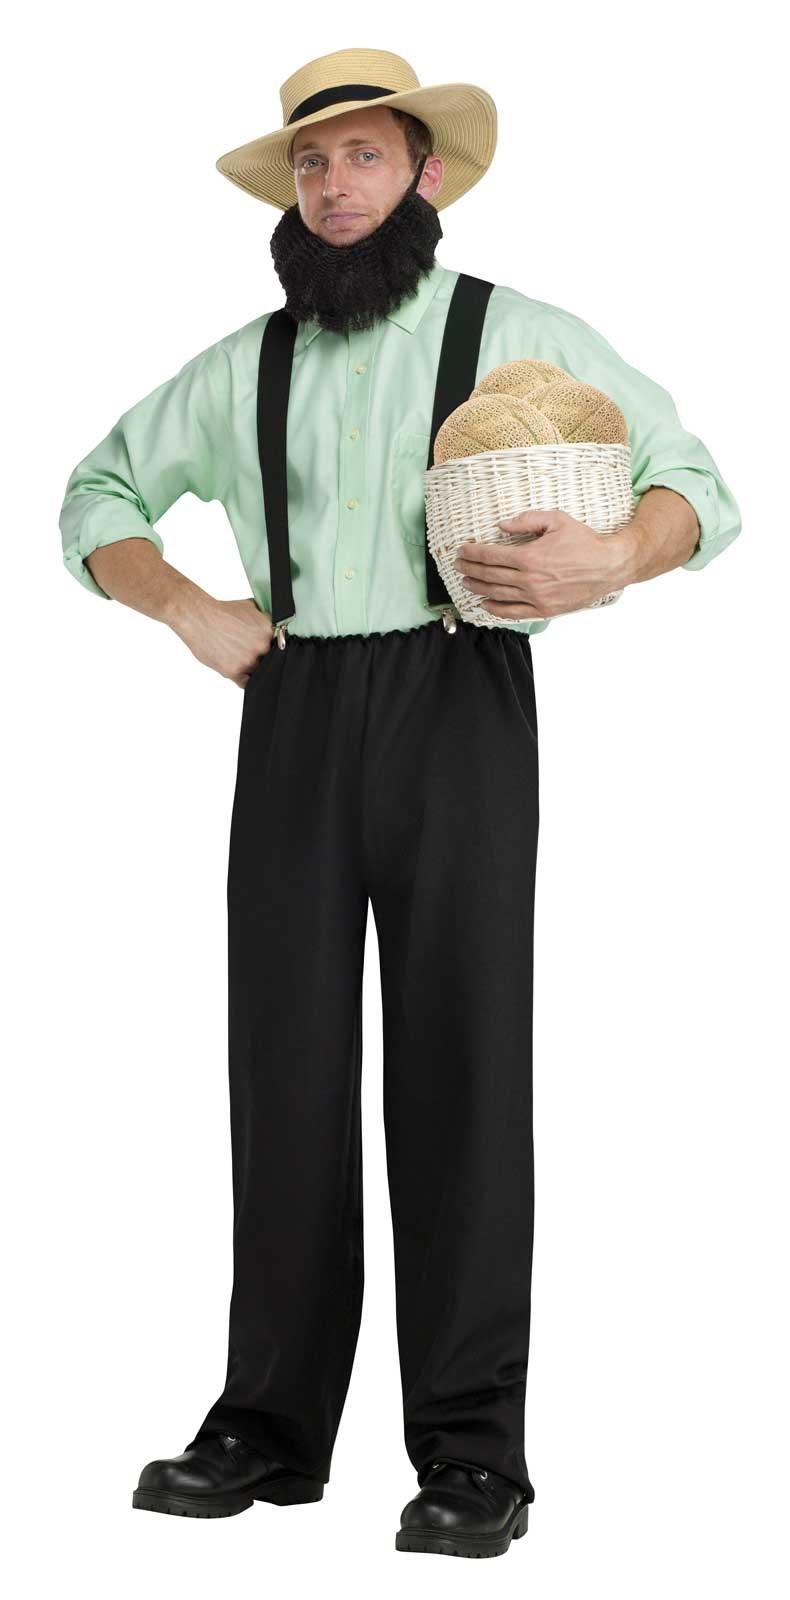 Image of Black Adult Amish Costume